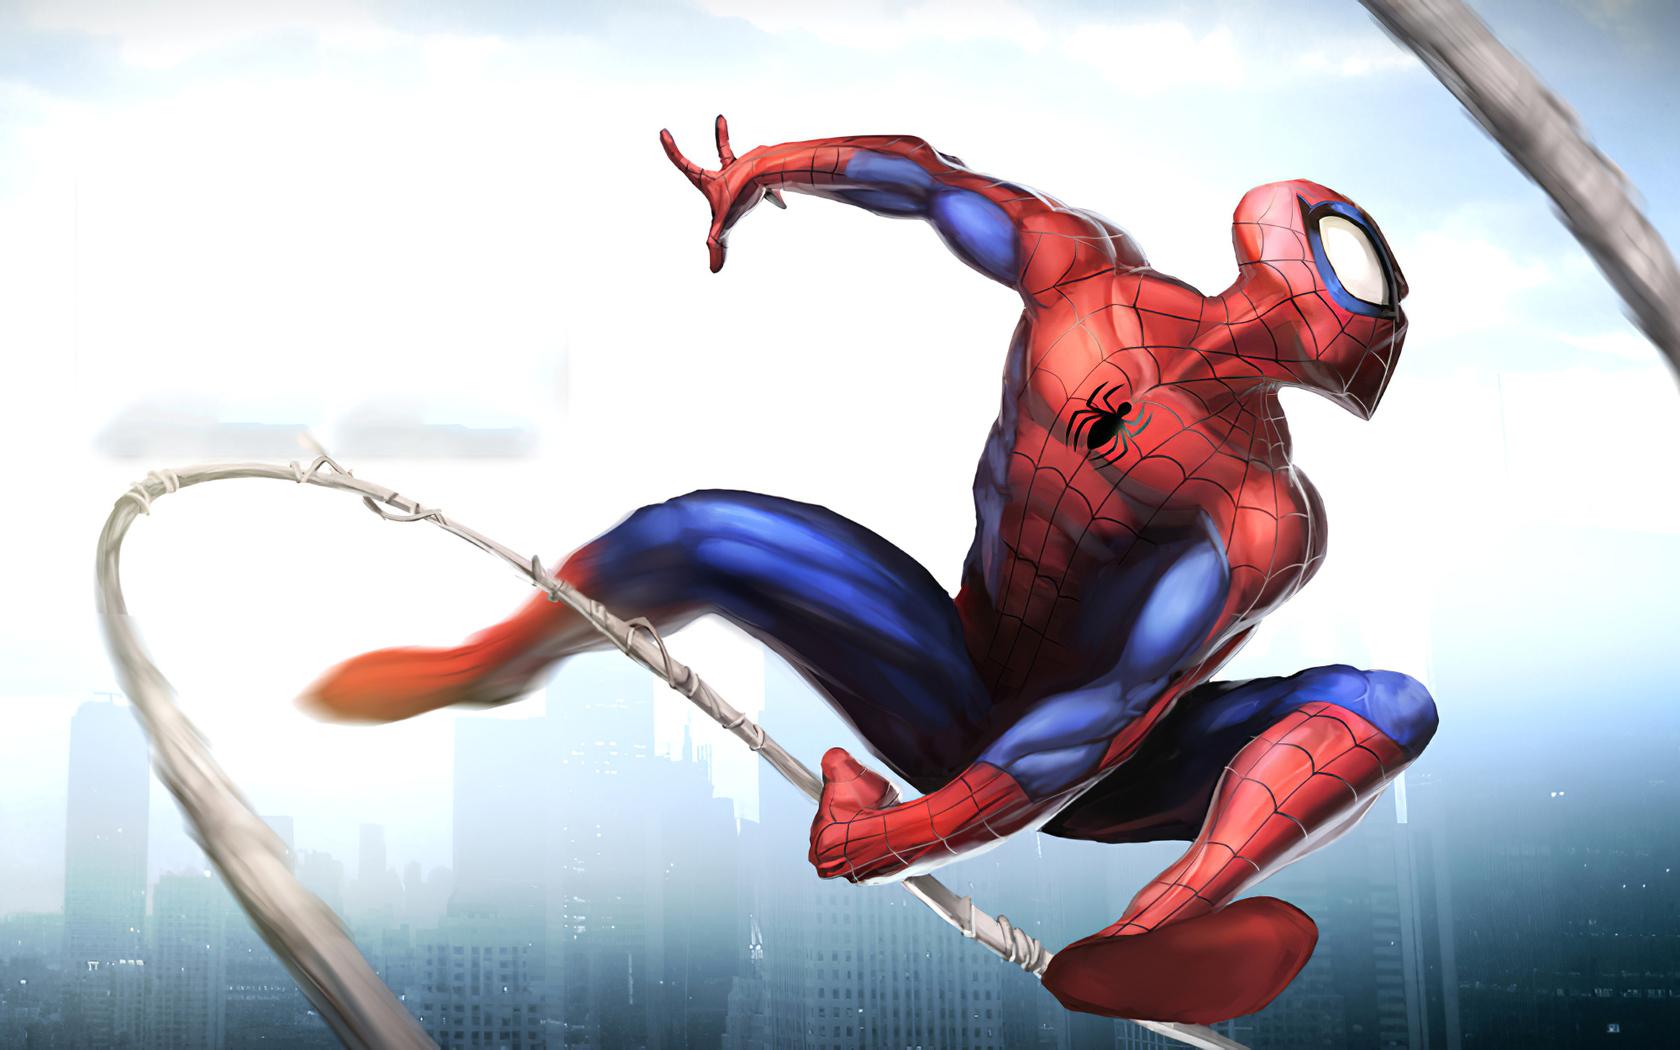 spider-man-unlimited-art-n2.jpg